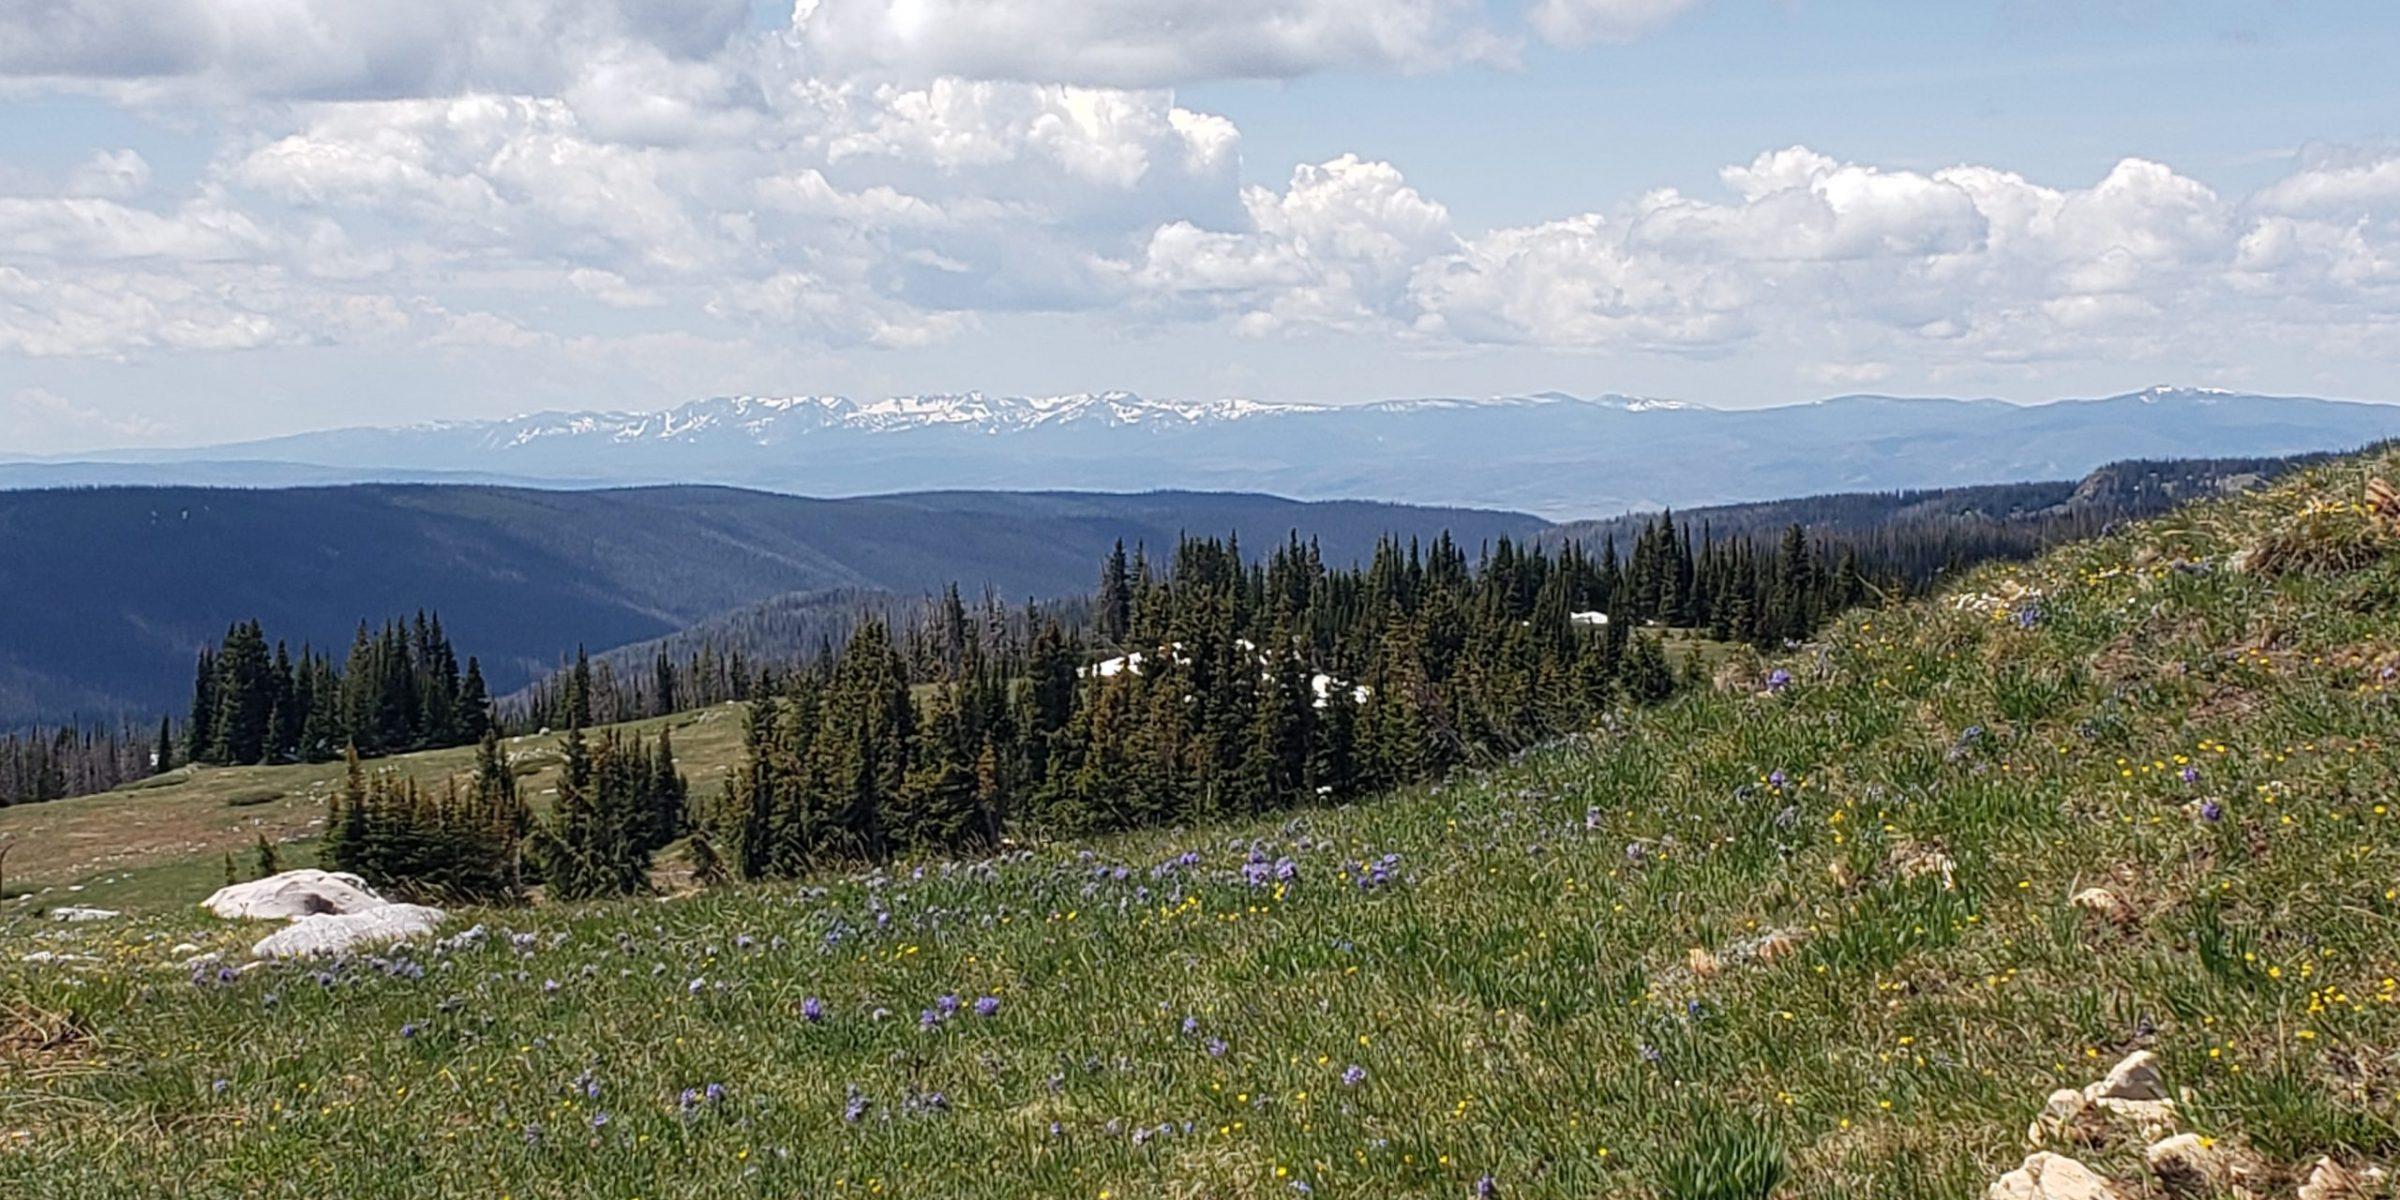 Southern Rockies Seed Network